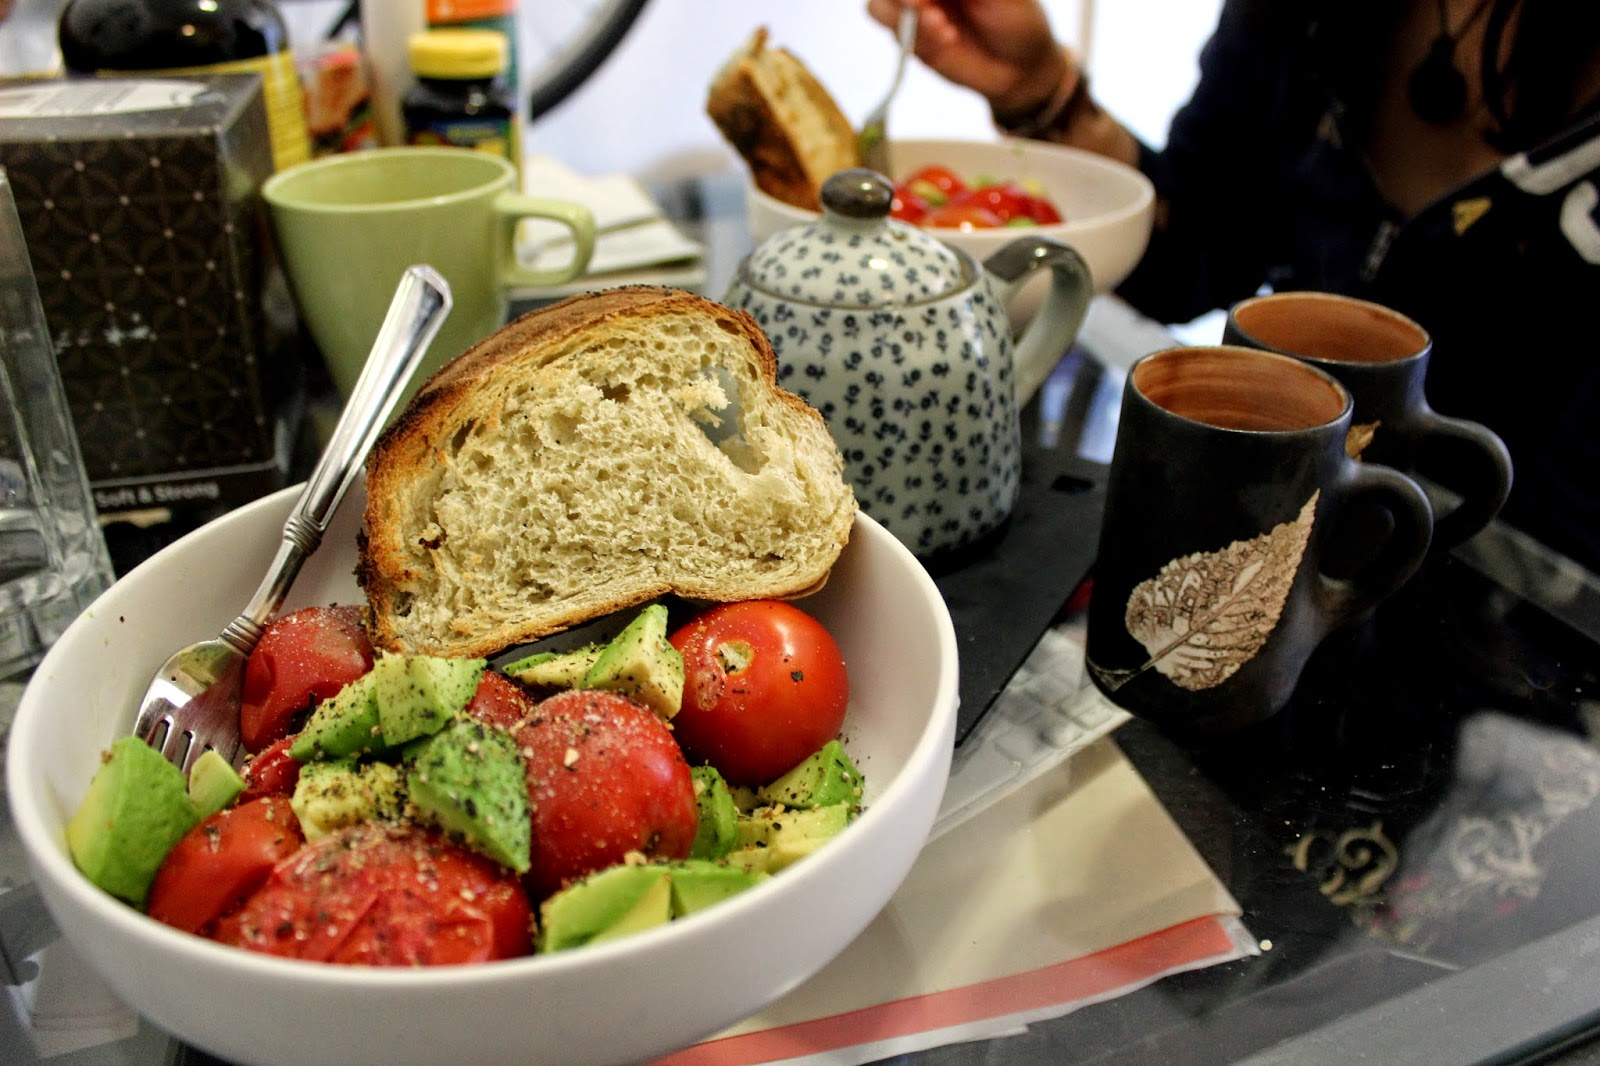 Carla's Boiled Tomatoe & Avocado Salad  LOVED IT! ♥.♥